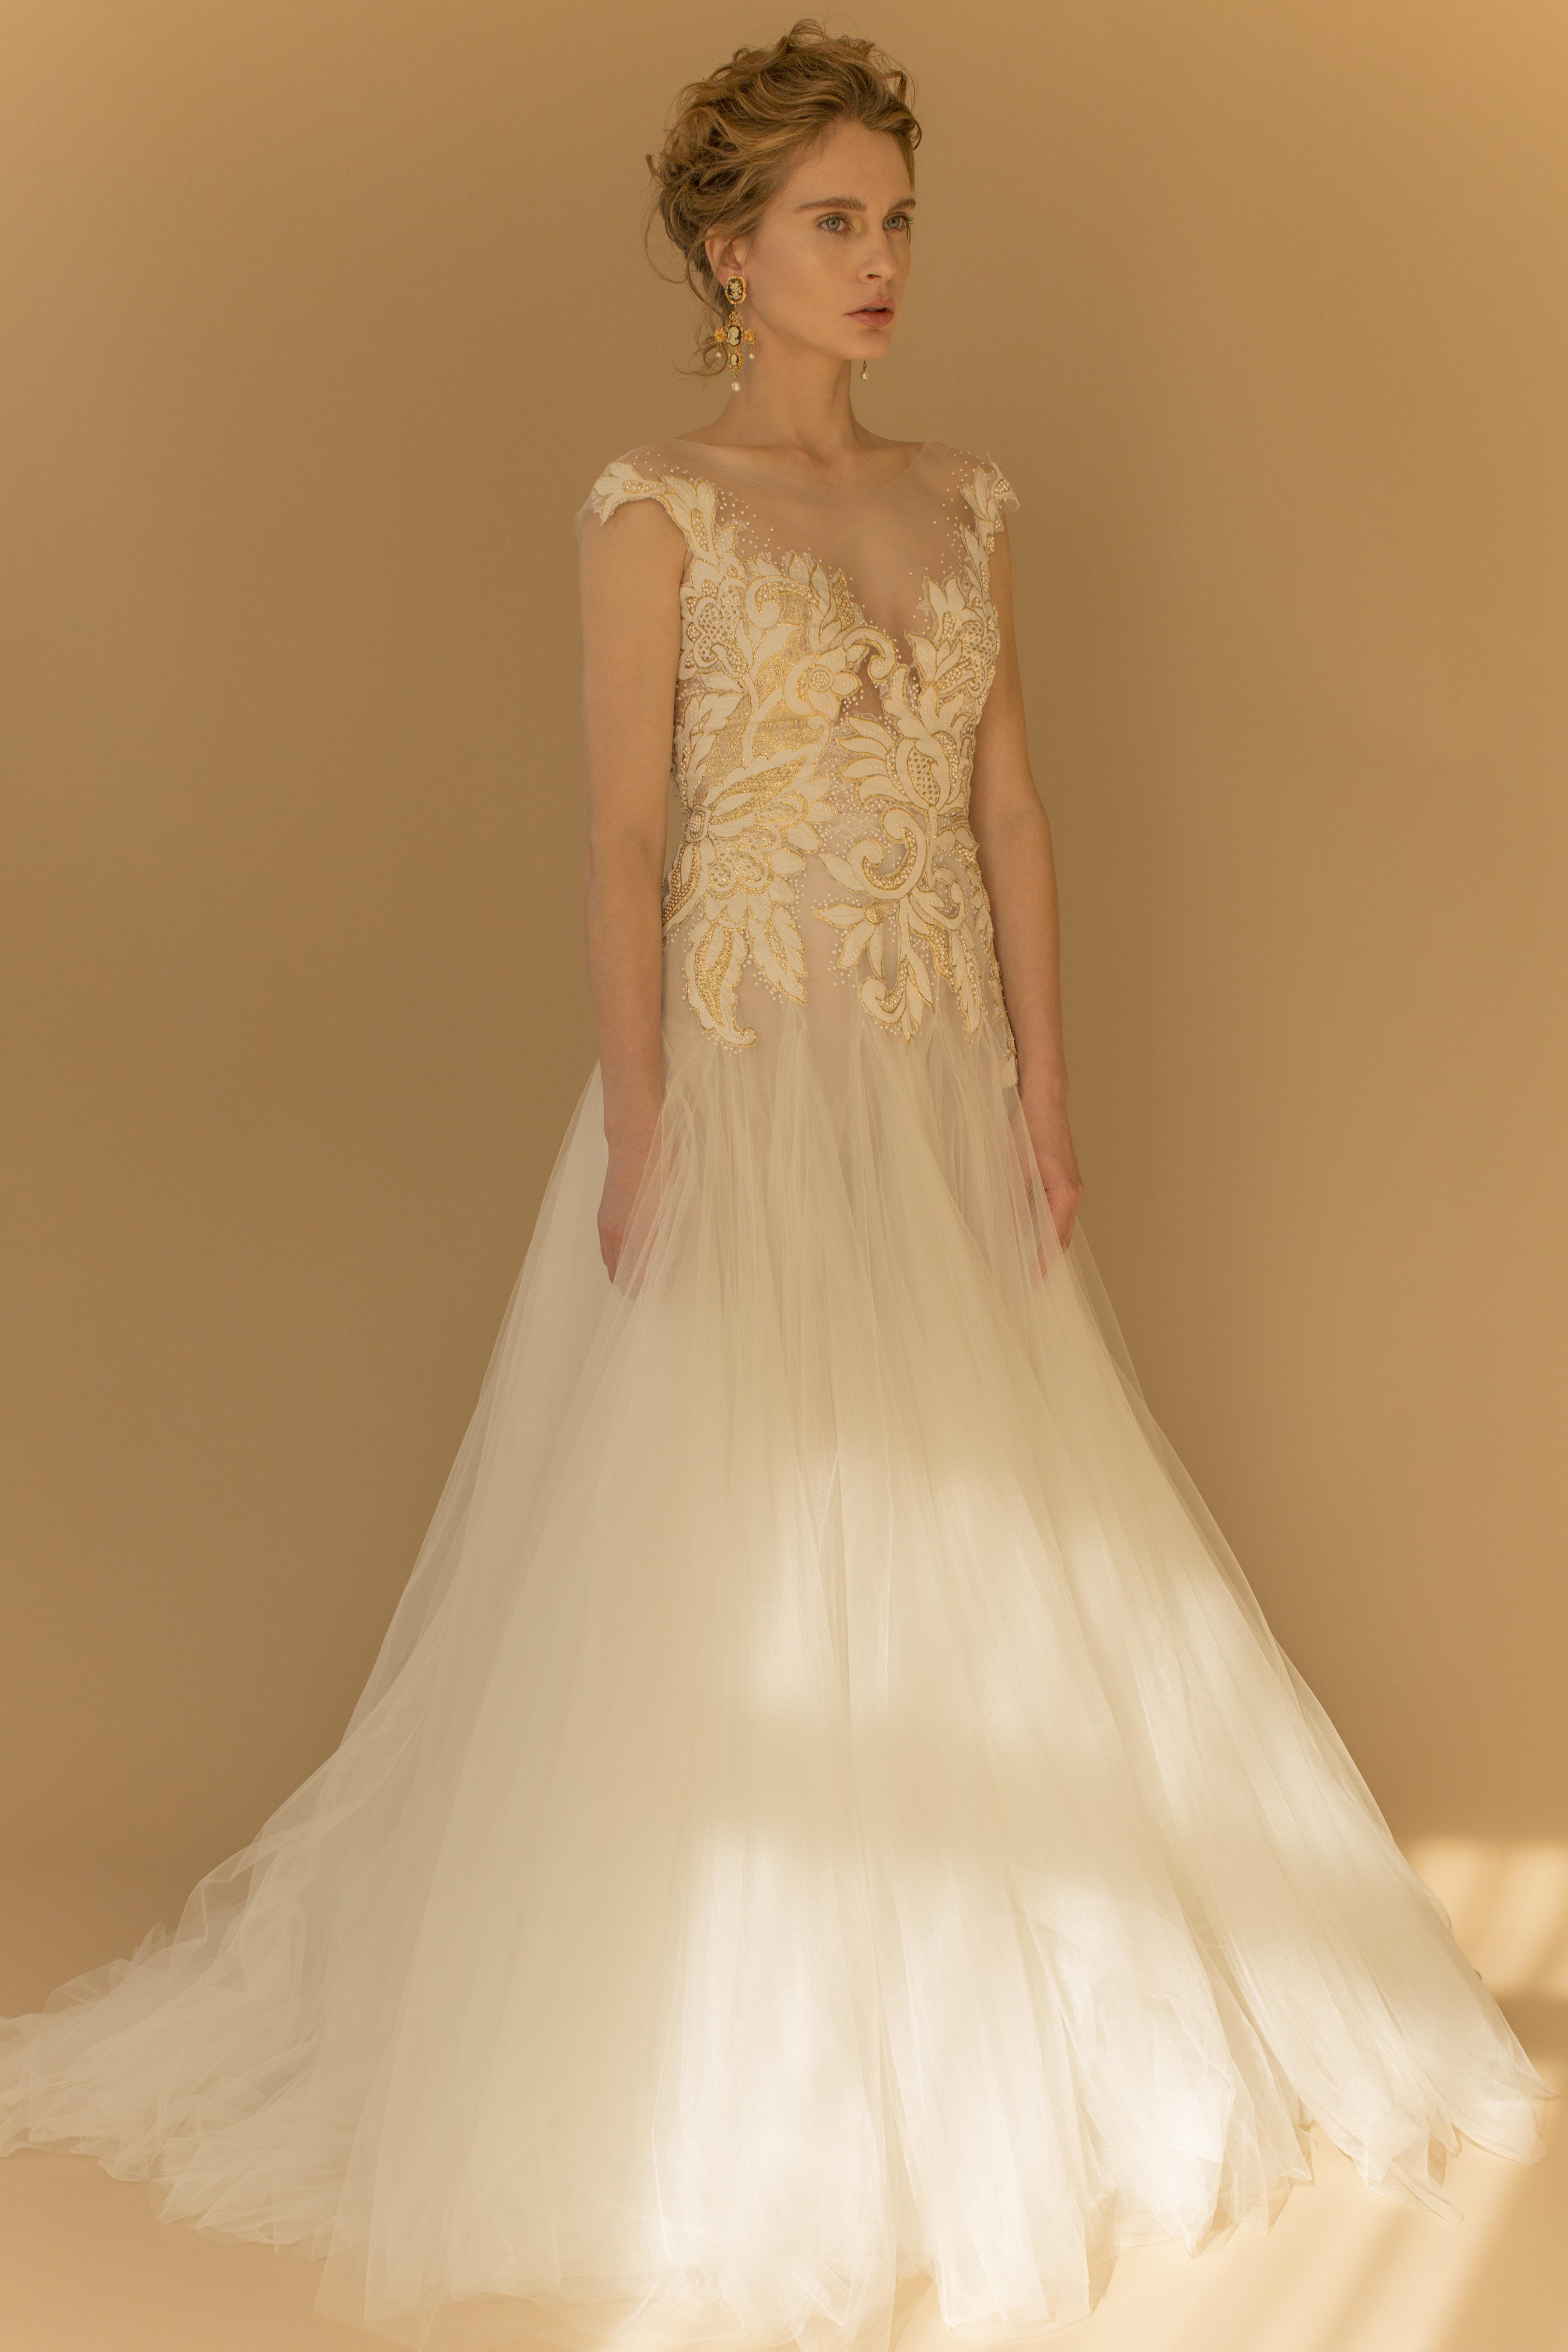 francesca miranda wedding dress fall 2018 white gold